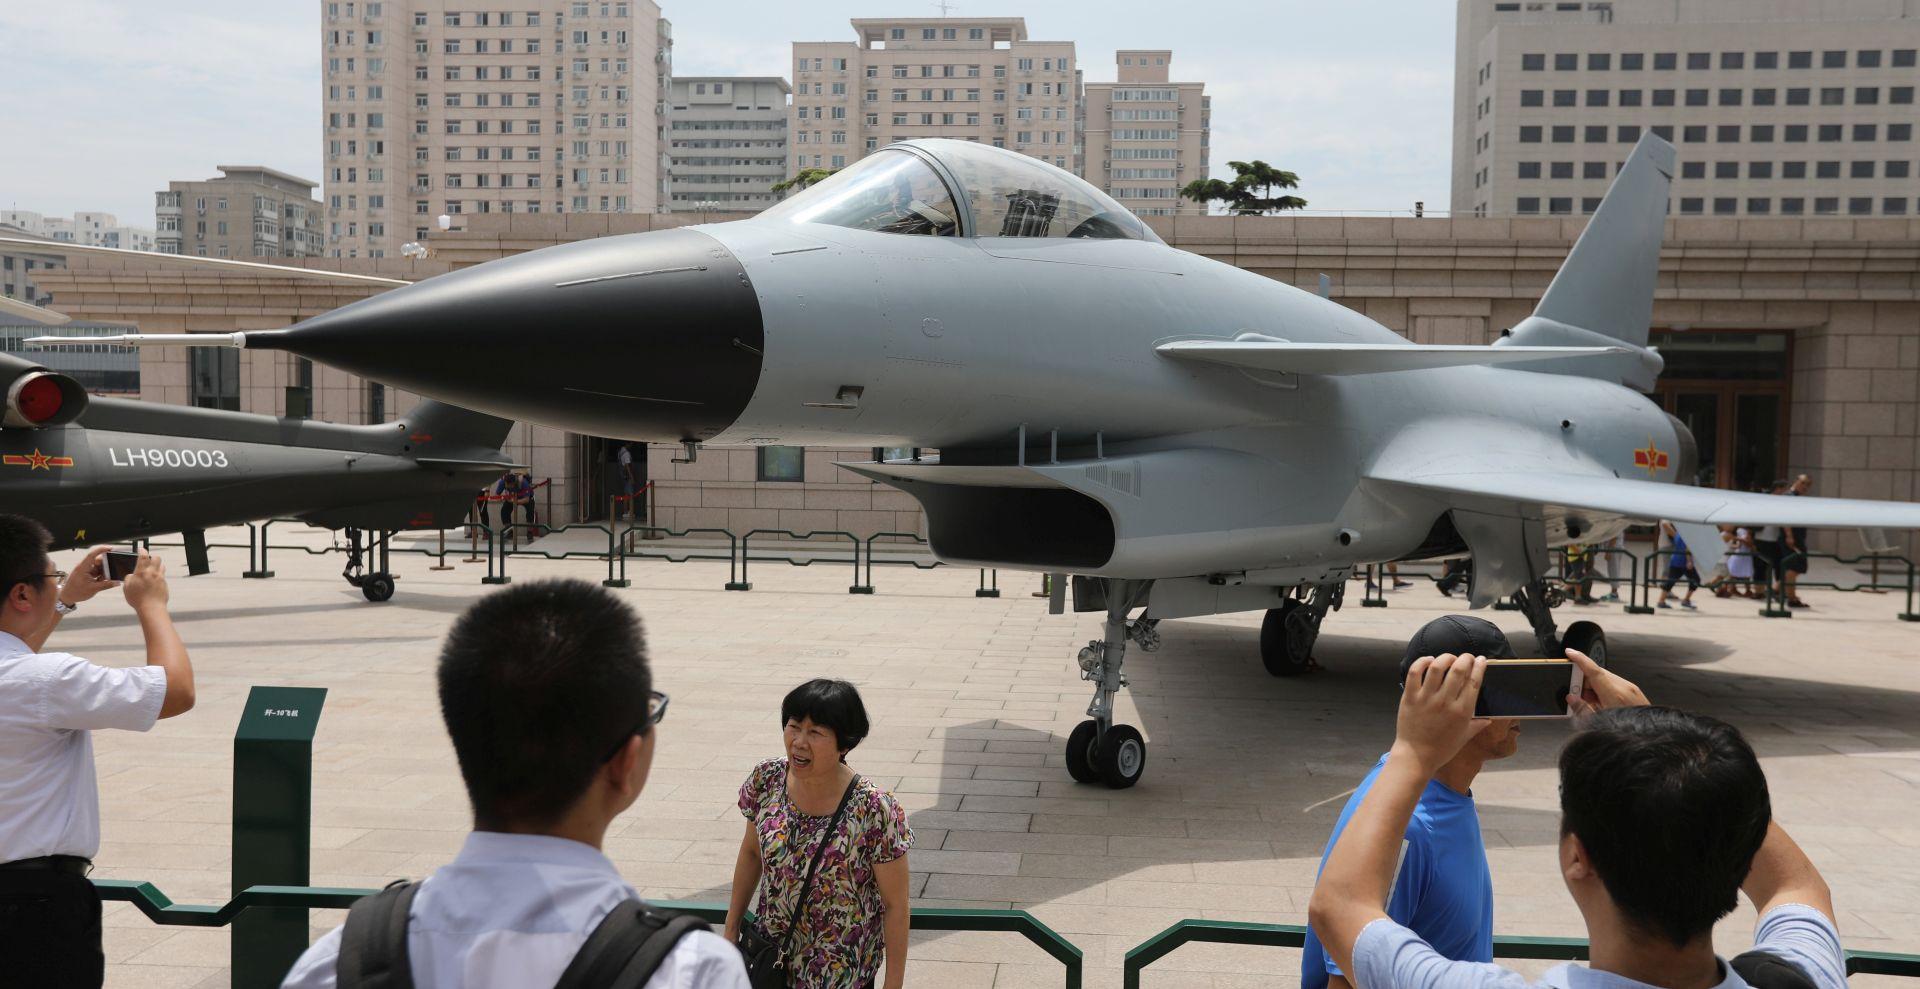 Kina svečanim mimohodom obilježila 90. obljetnicu osnutka svoje vojske